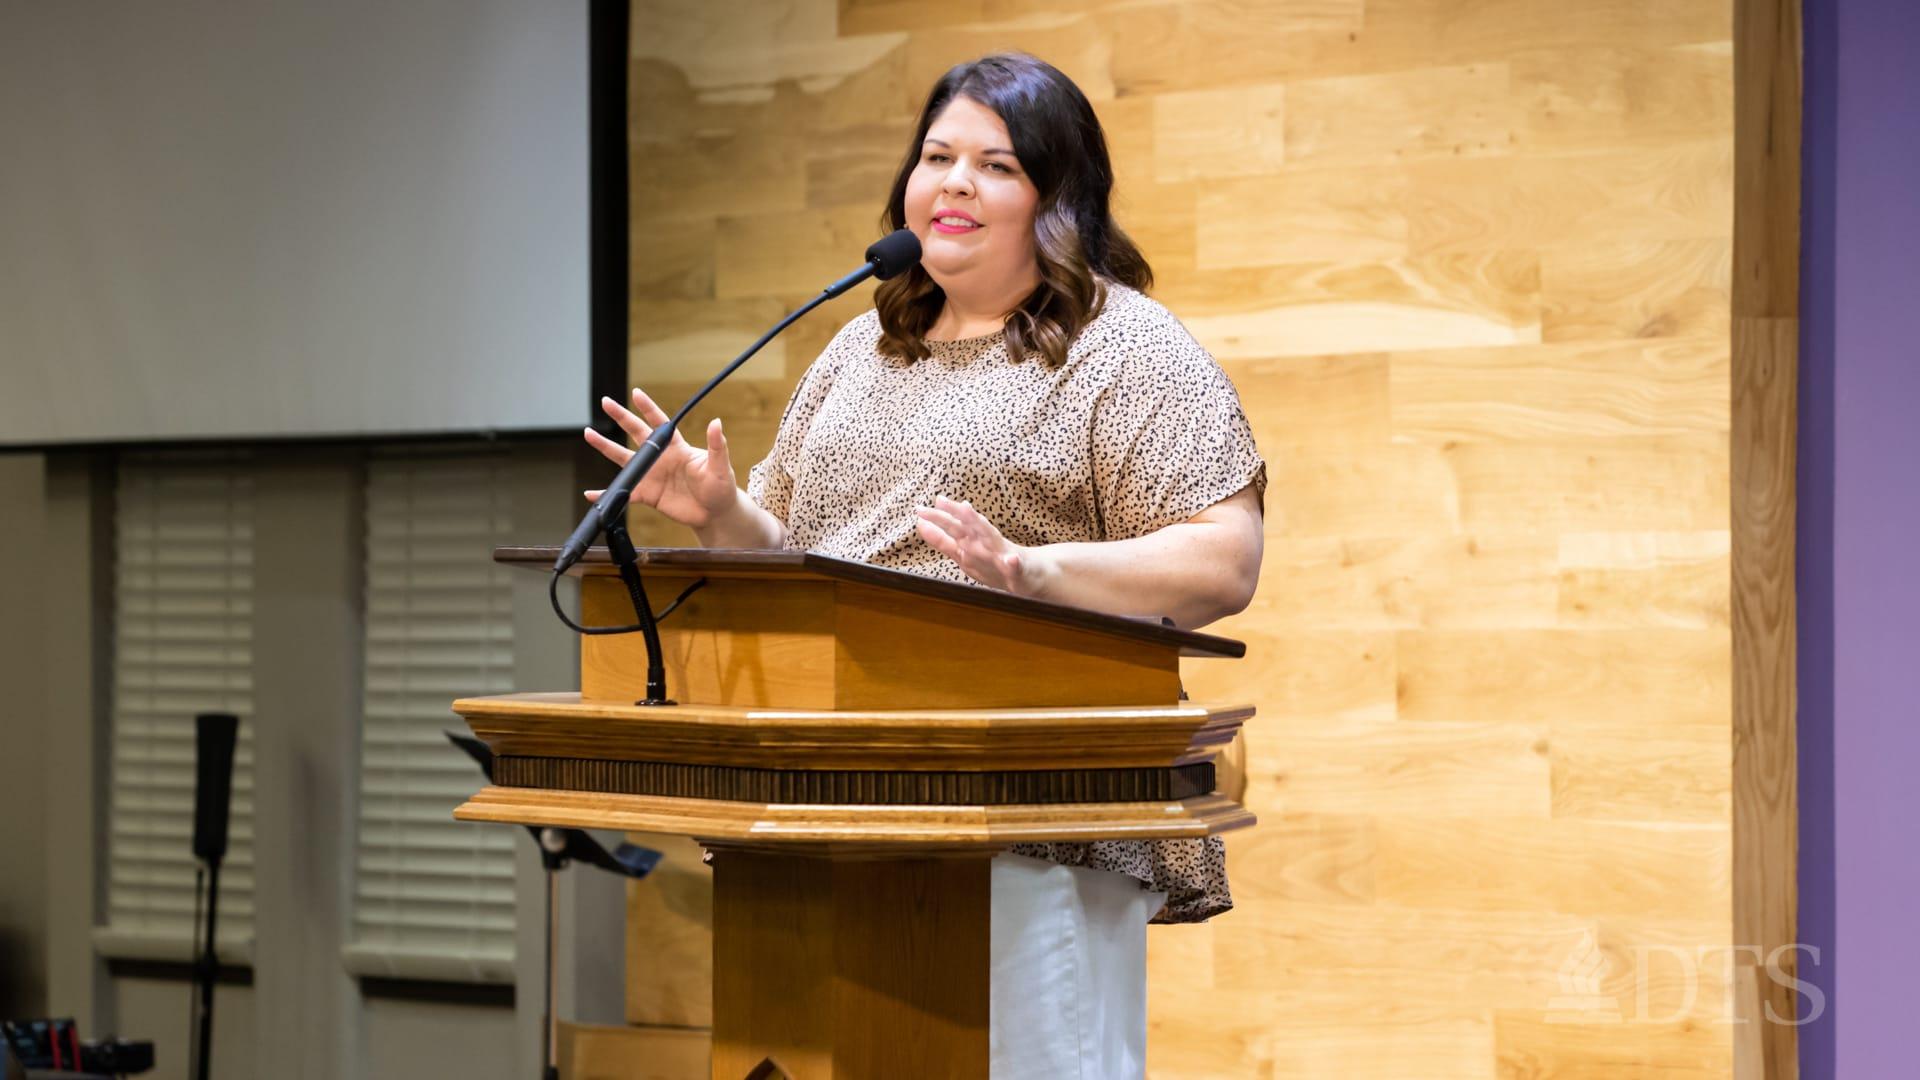 A photo of Liz Rodriguez in Lamb Auditorium at DTS